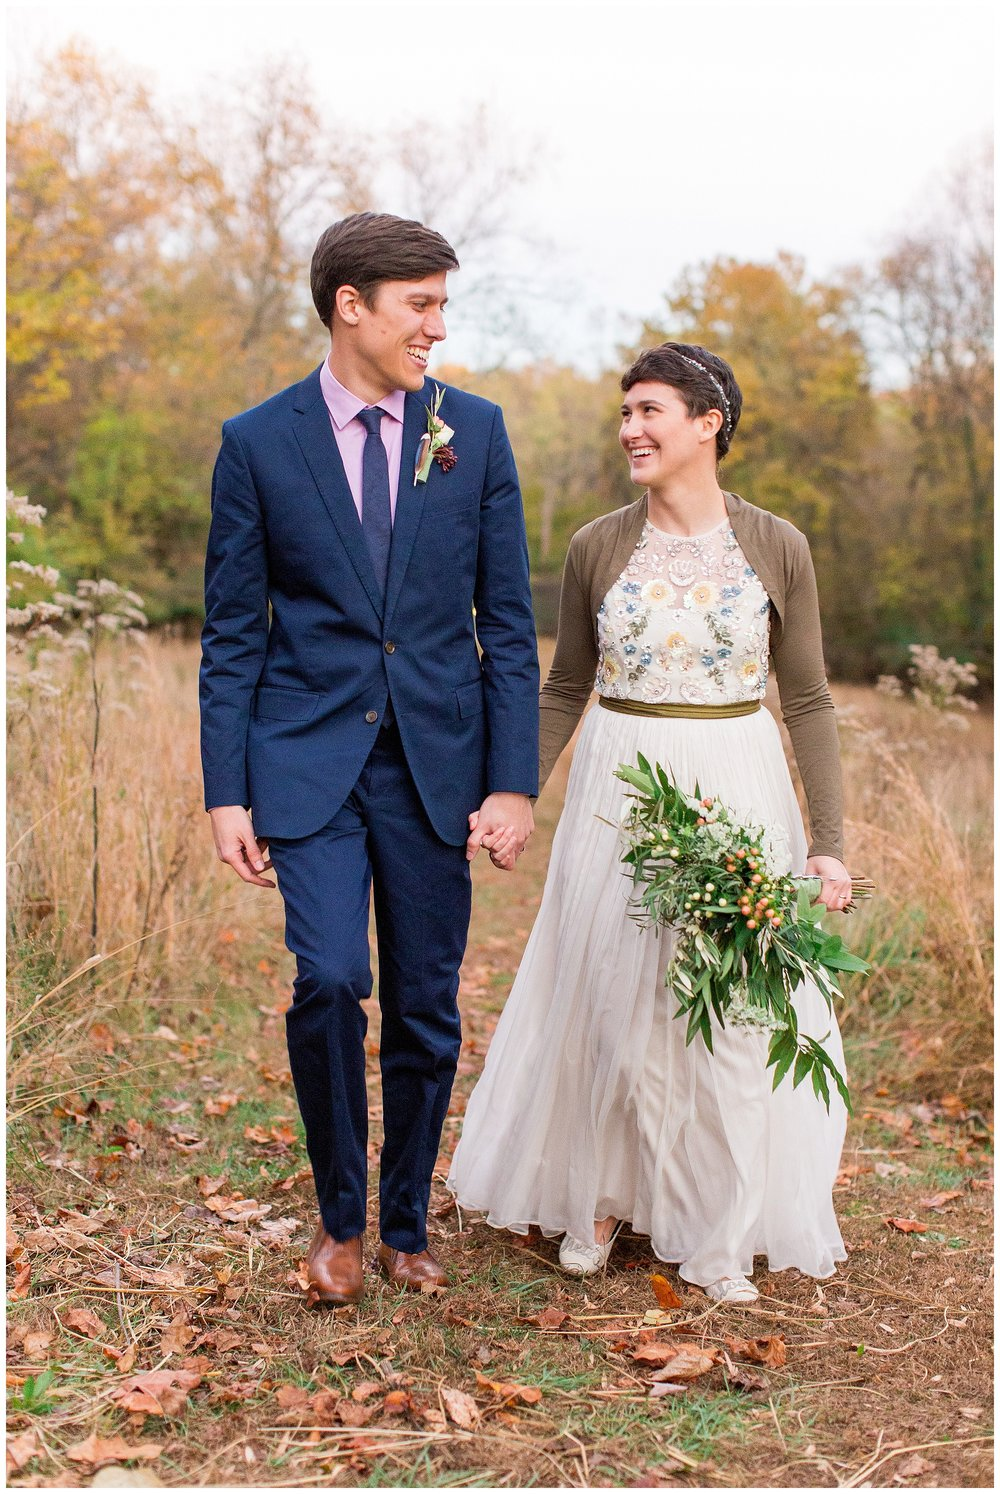 Woodend_wedding_0060.jpg